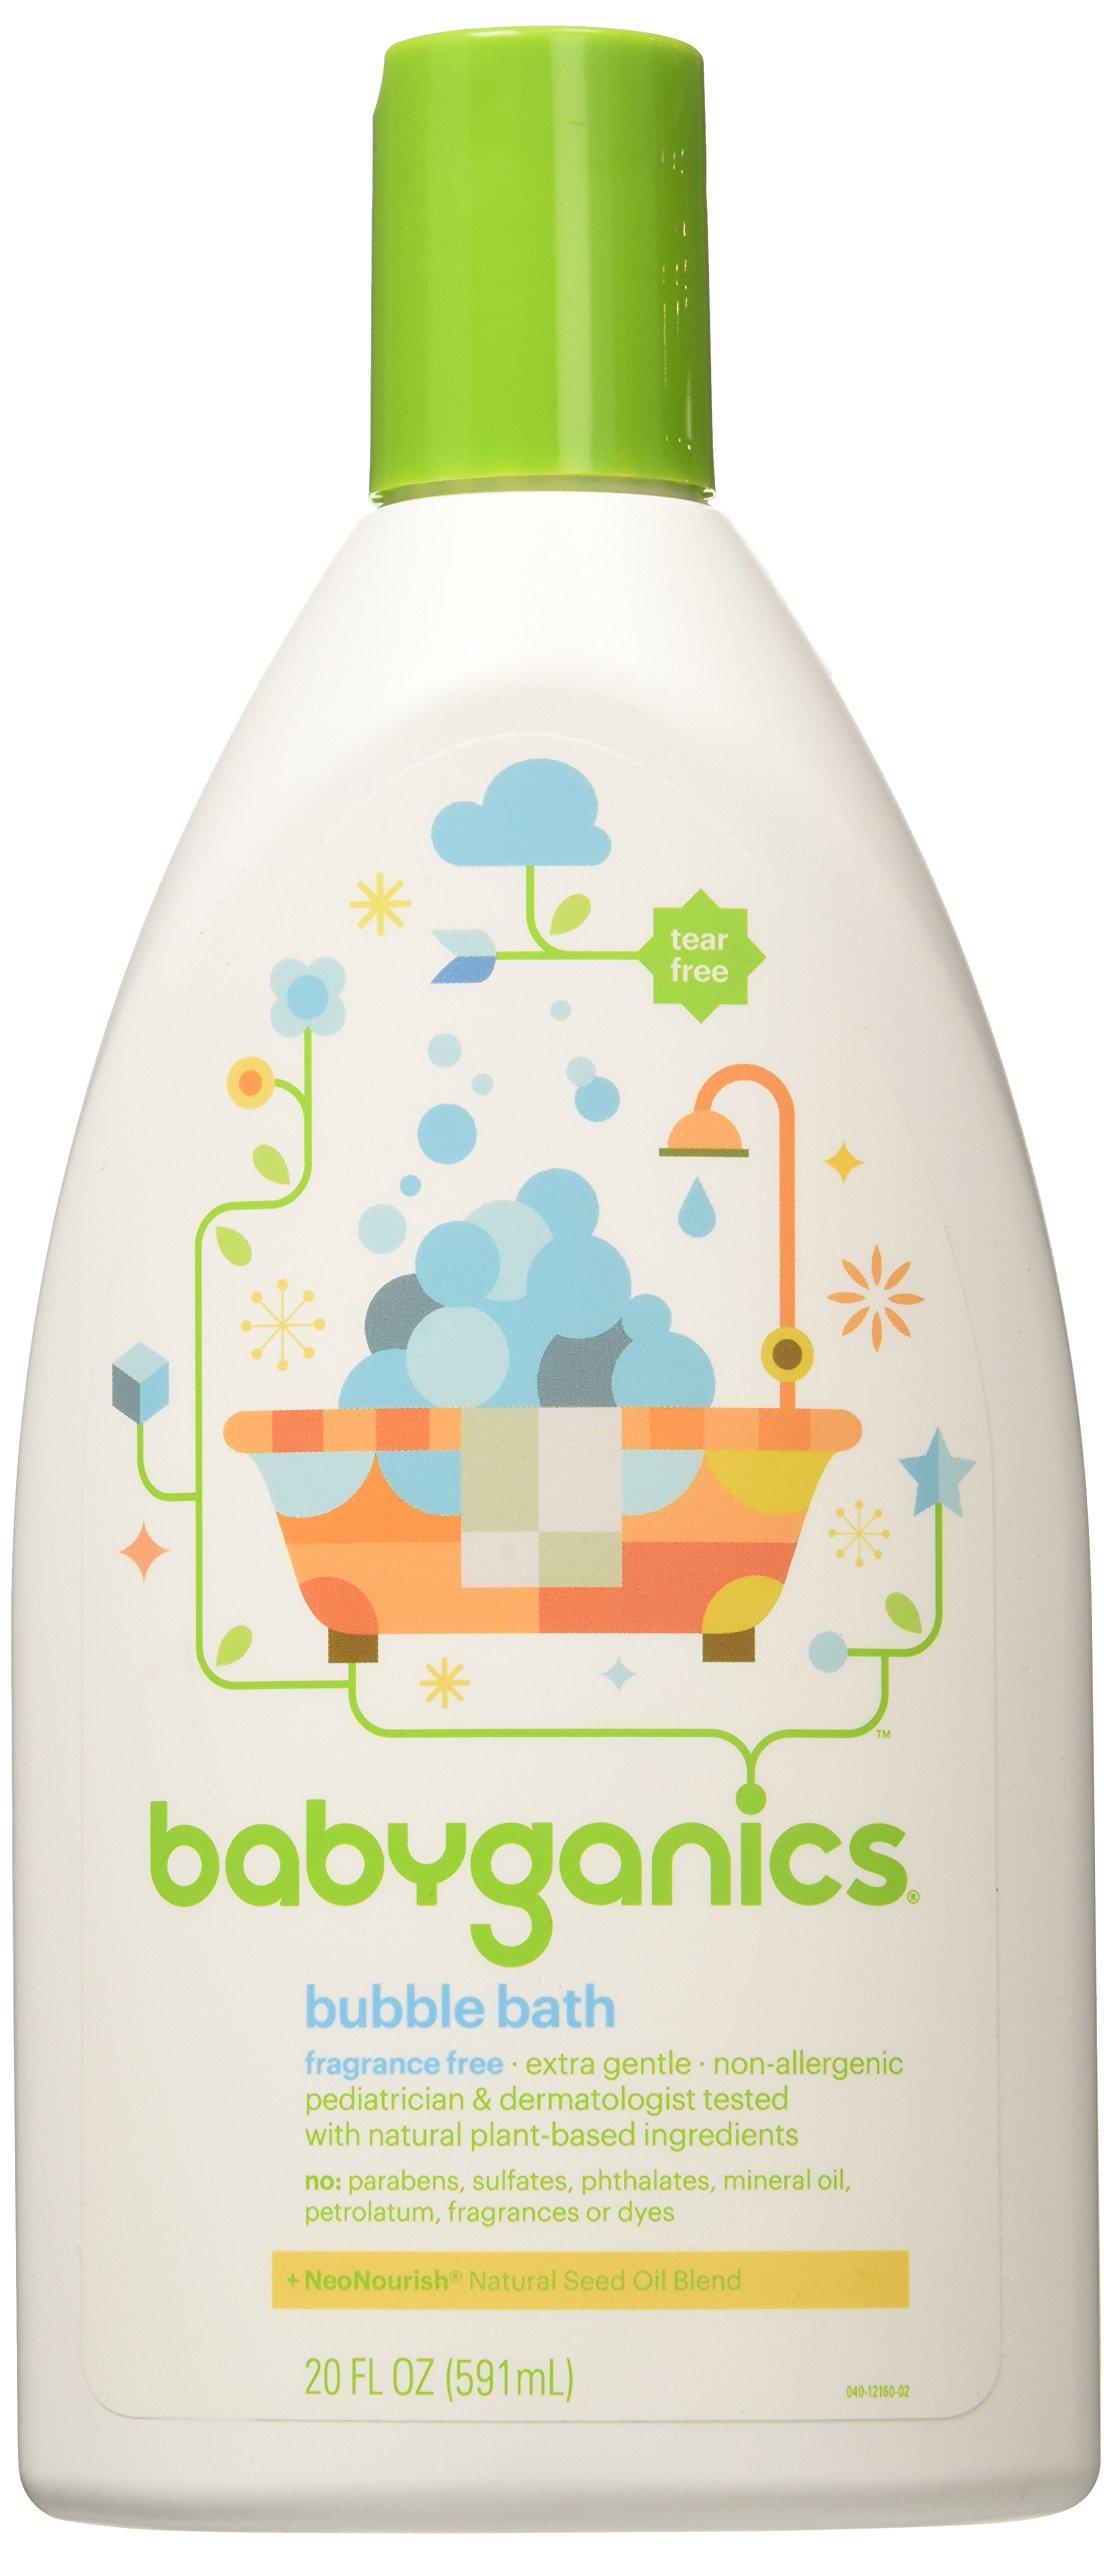 Babyganics Bubble Bath Bundle,  20 Oz Bottles,  Fragrance Free (Pack of 2) by Babyganics